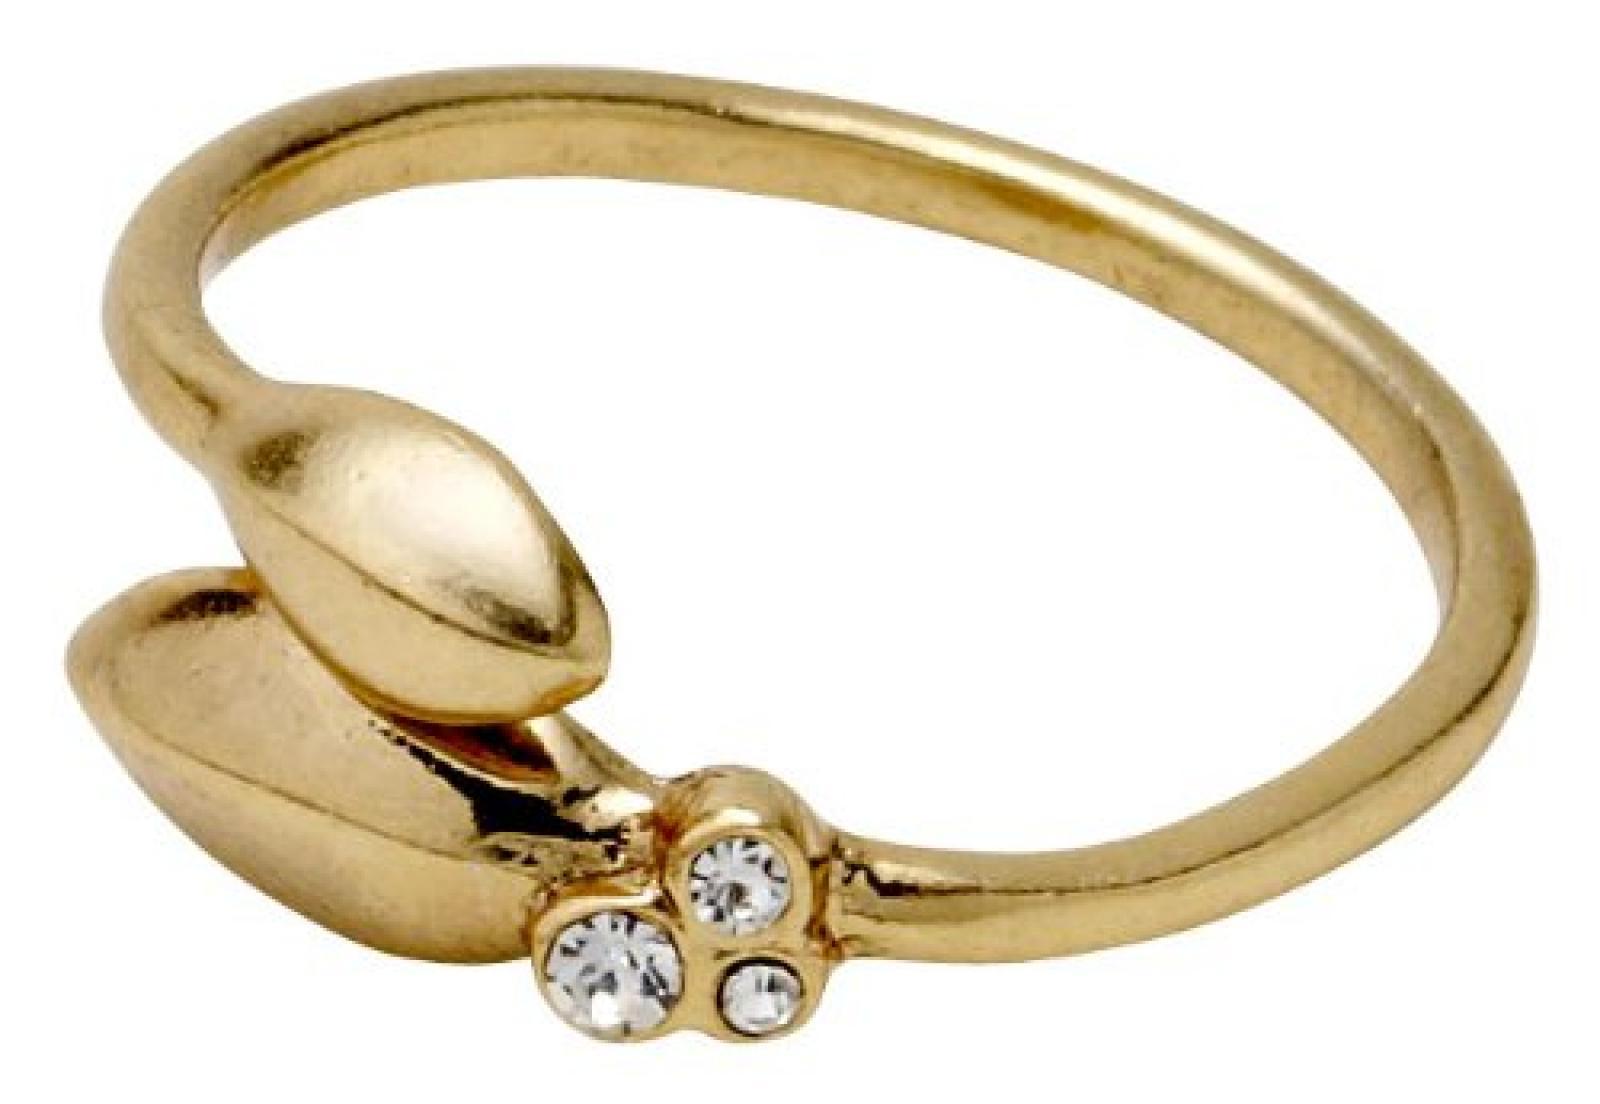 Pilgrim Jewelry Damen-Ring Messing Kristall Glaskristall Clarity weiß Gr. 161342004